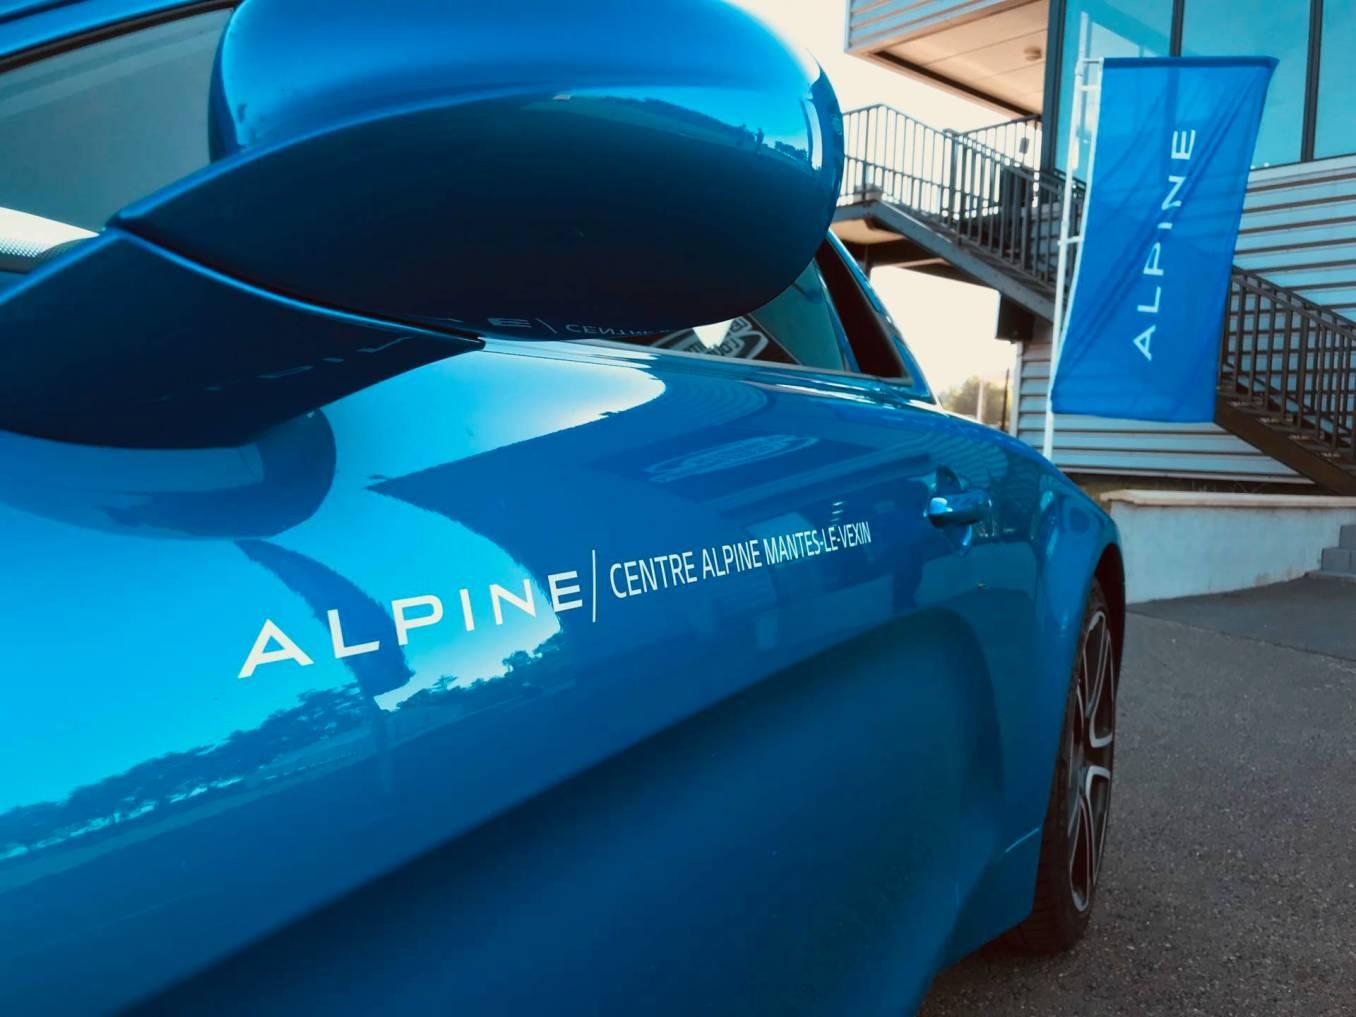 IMG 7626 1 | Centre Alpine Mantes le Vexin